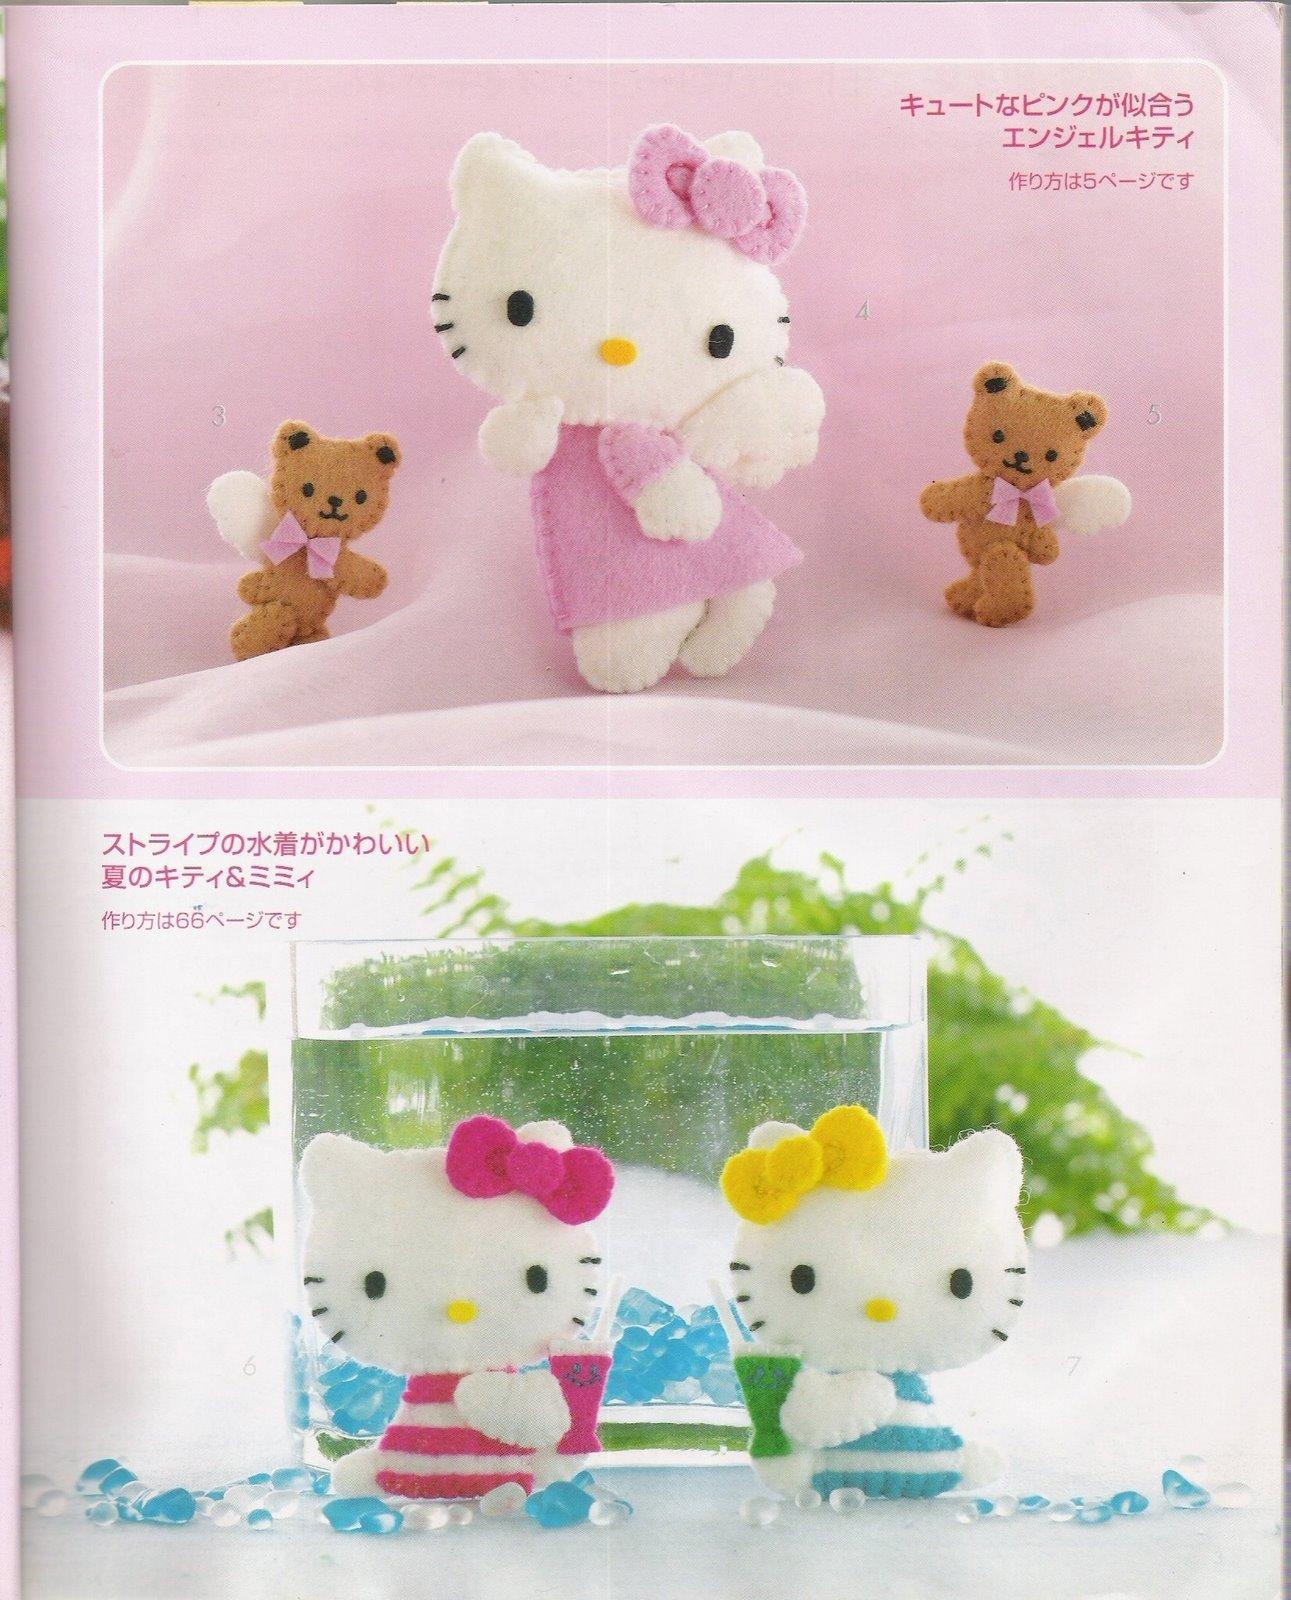 Imagenes De Baños De Hello Kitty ~ Dikidu.com